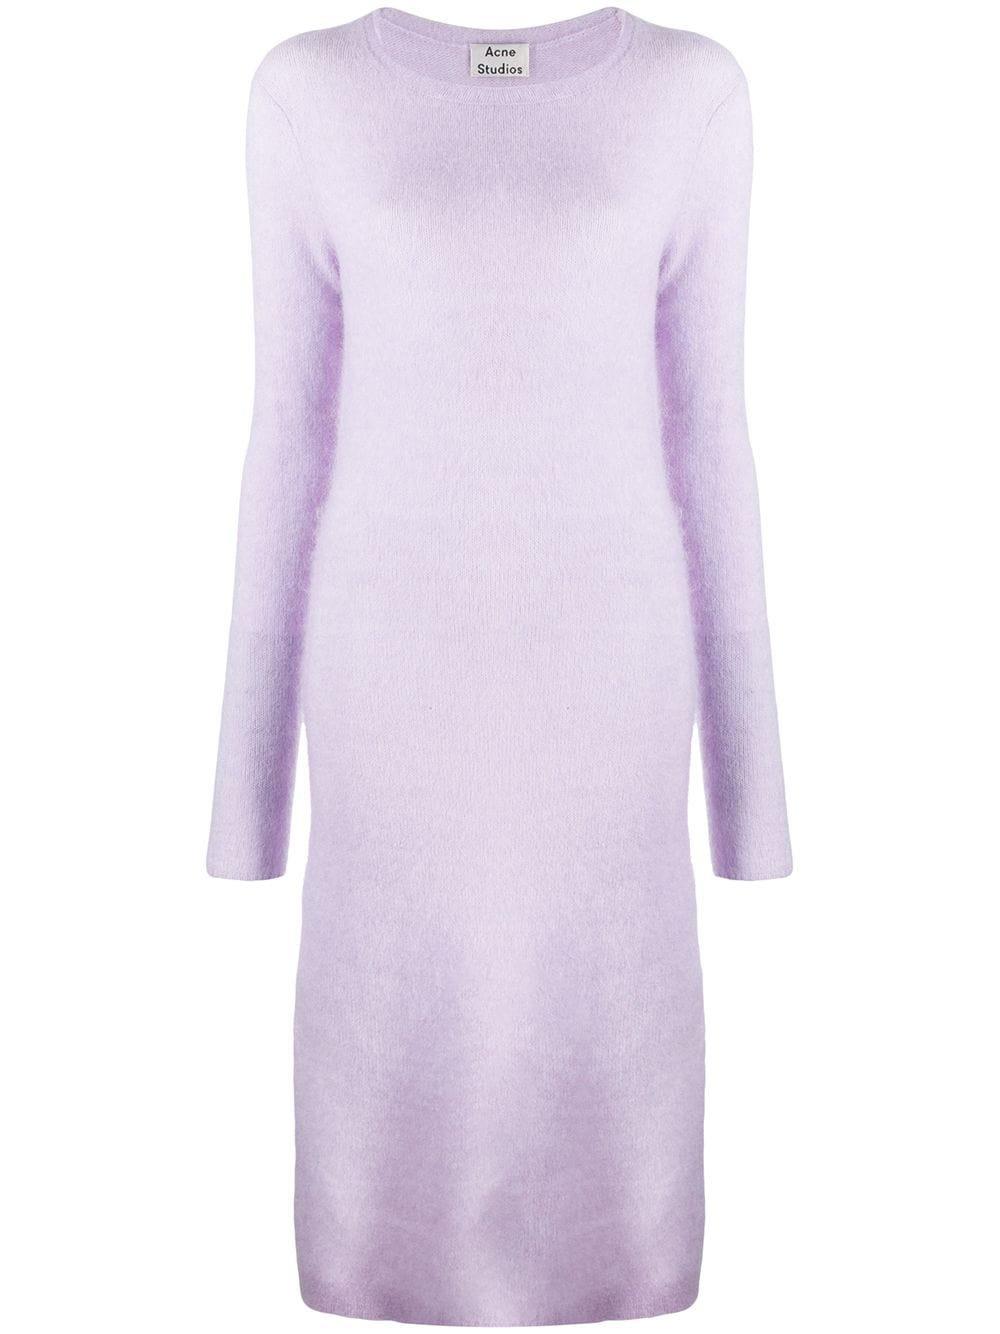 Acne Studios Knitted Midi Dress - Farfetch